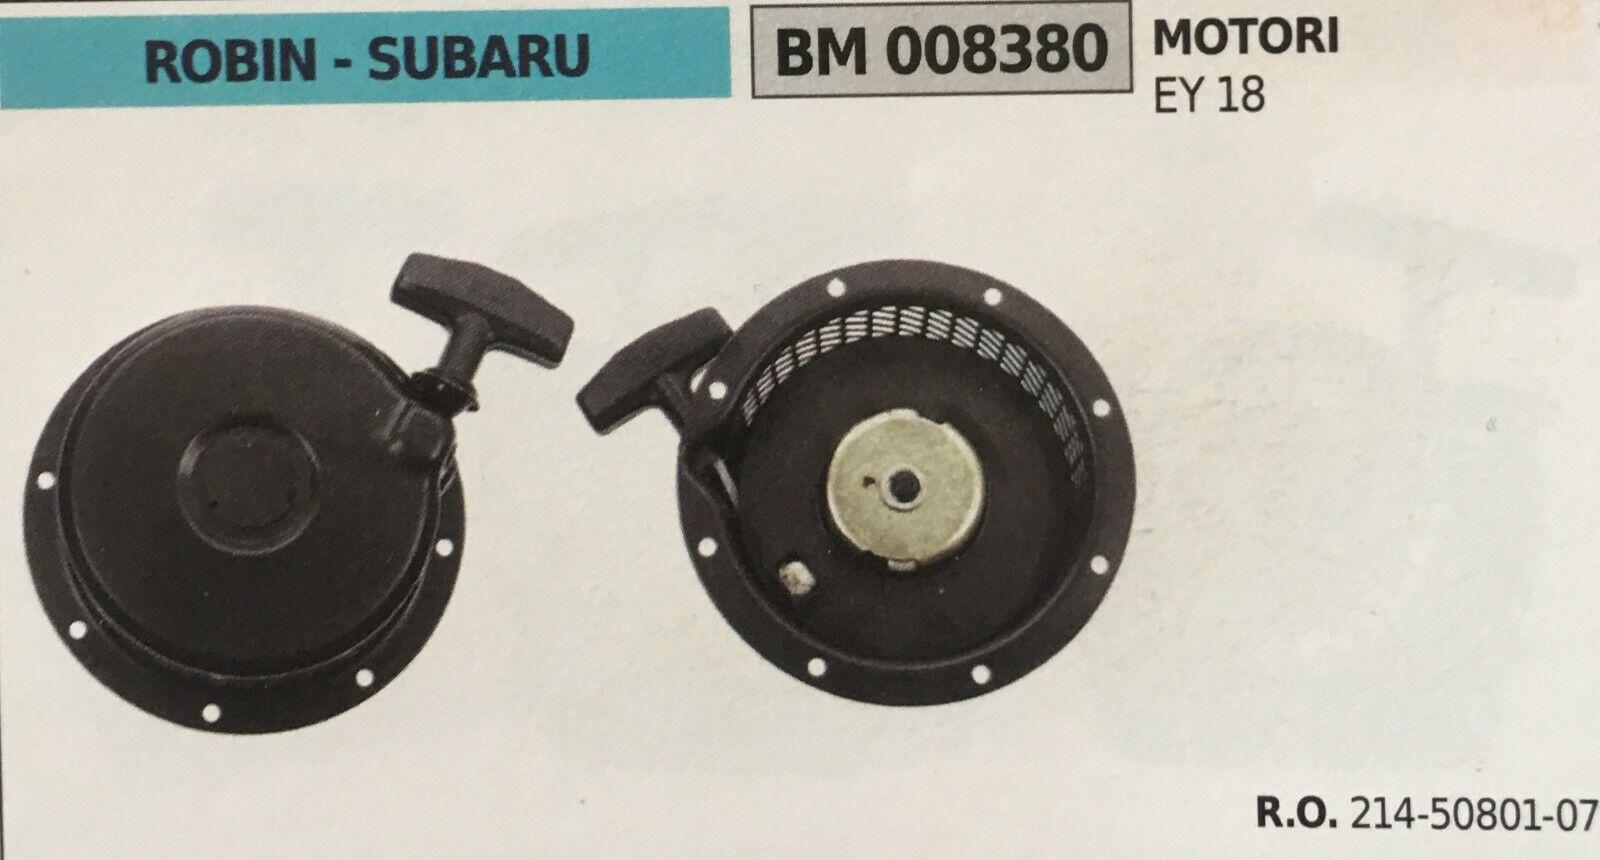 AVVIAMENTO COMPLETO BRUMAR ROBIN - SUBARU BM008380